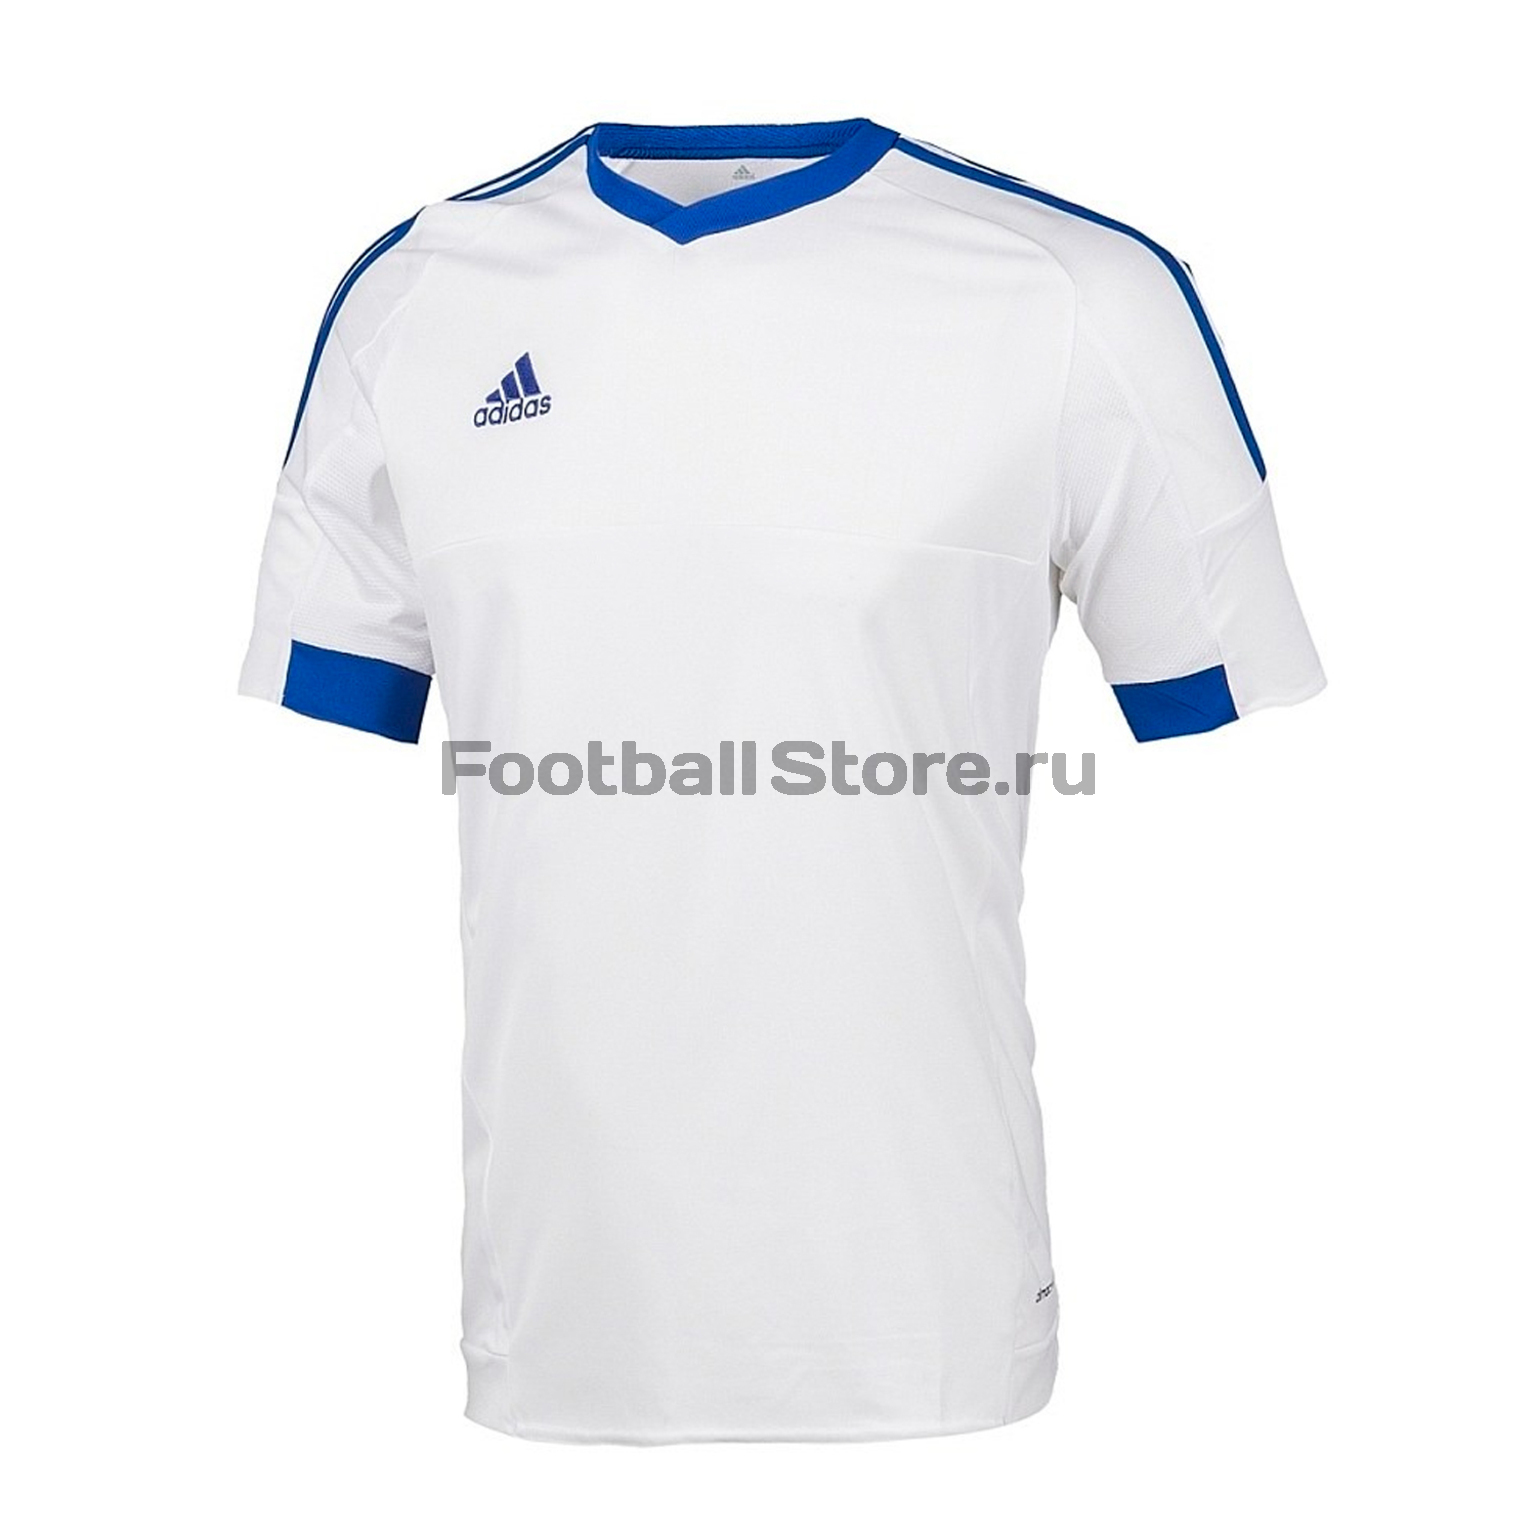 Футболка Adidas Tiro 15 JSY S22366